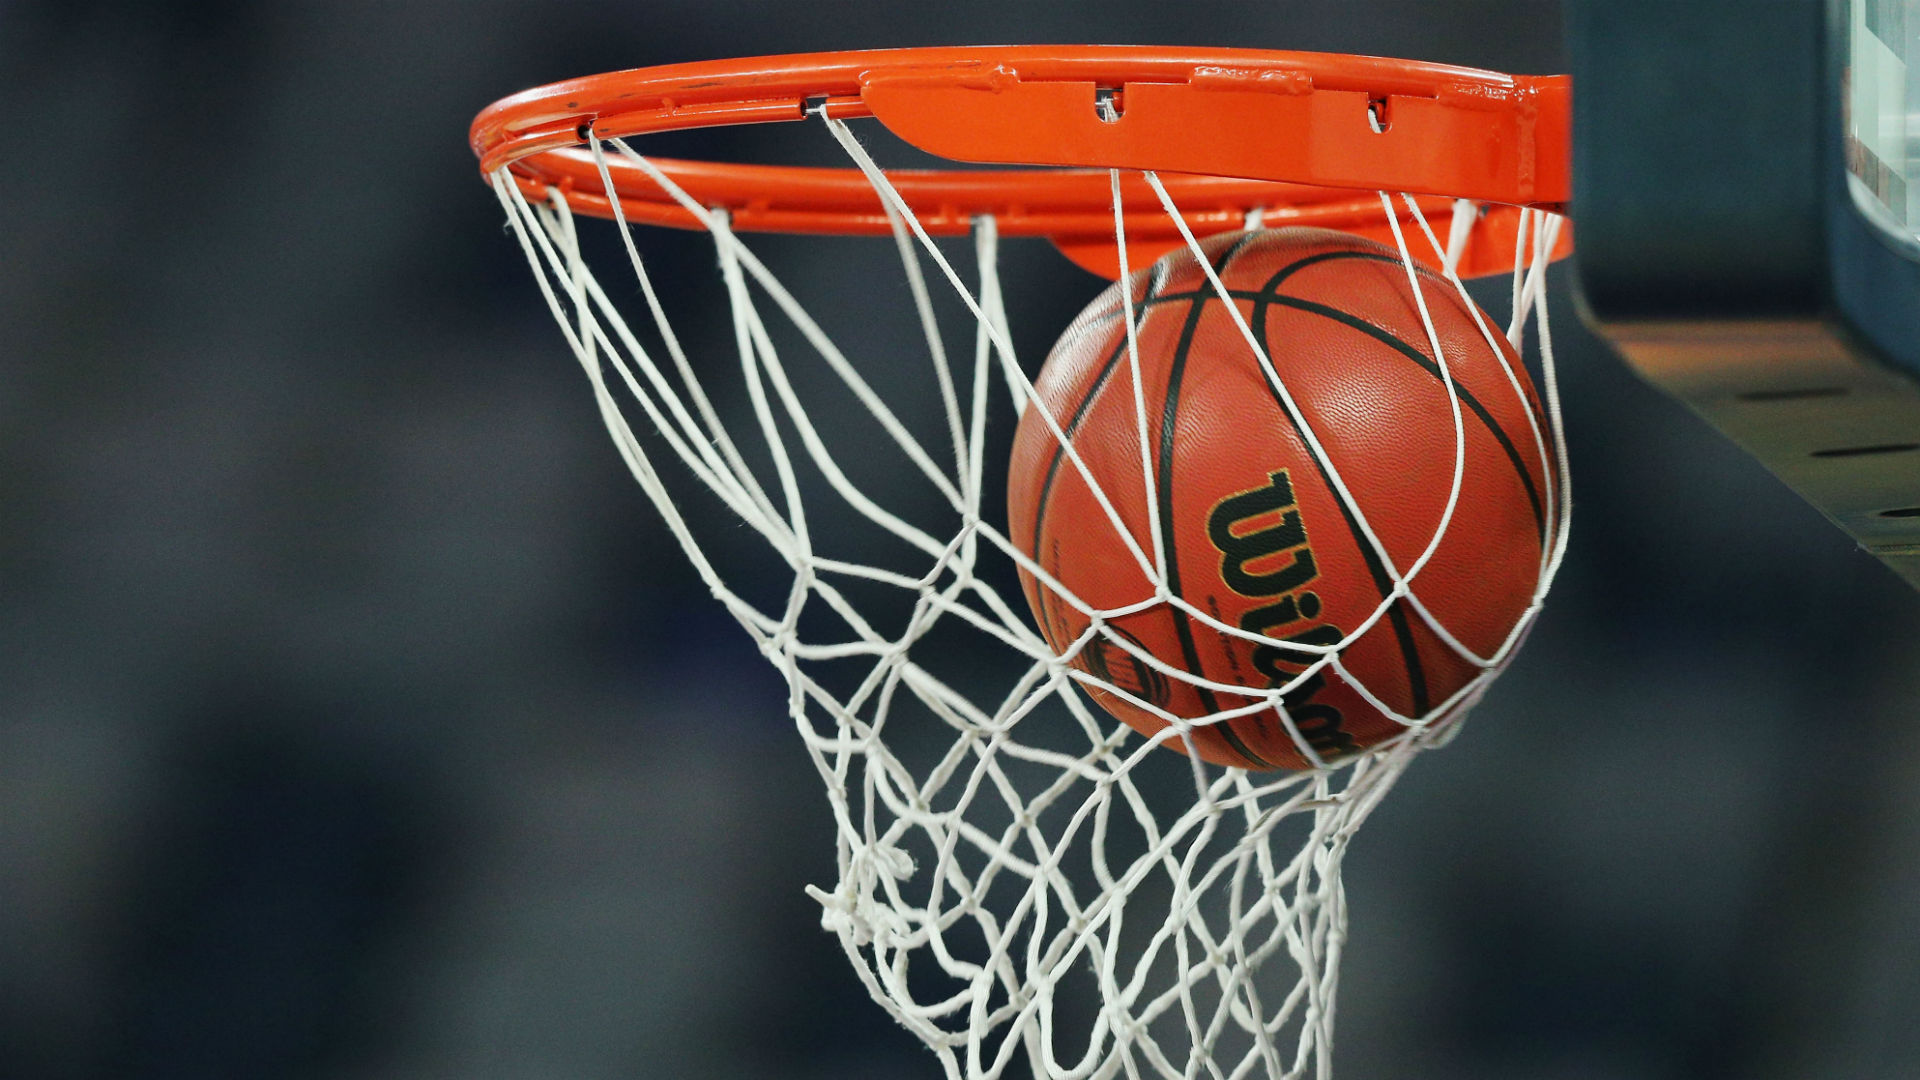 National Basketball Association hopeful dies after on-court collapse